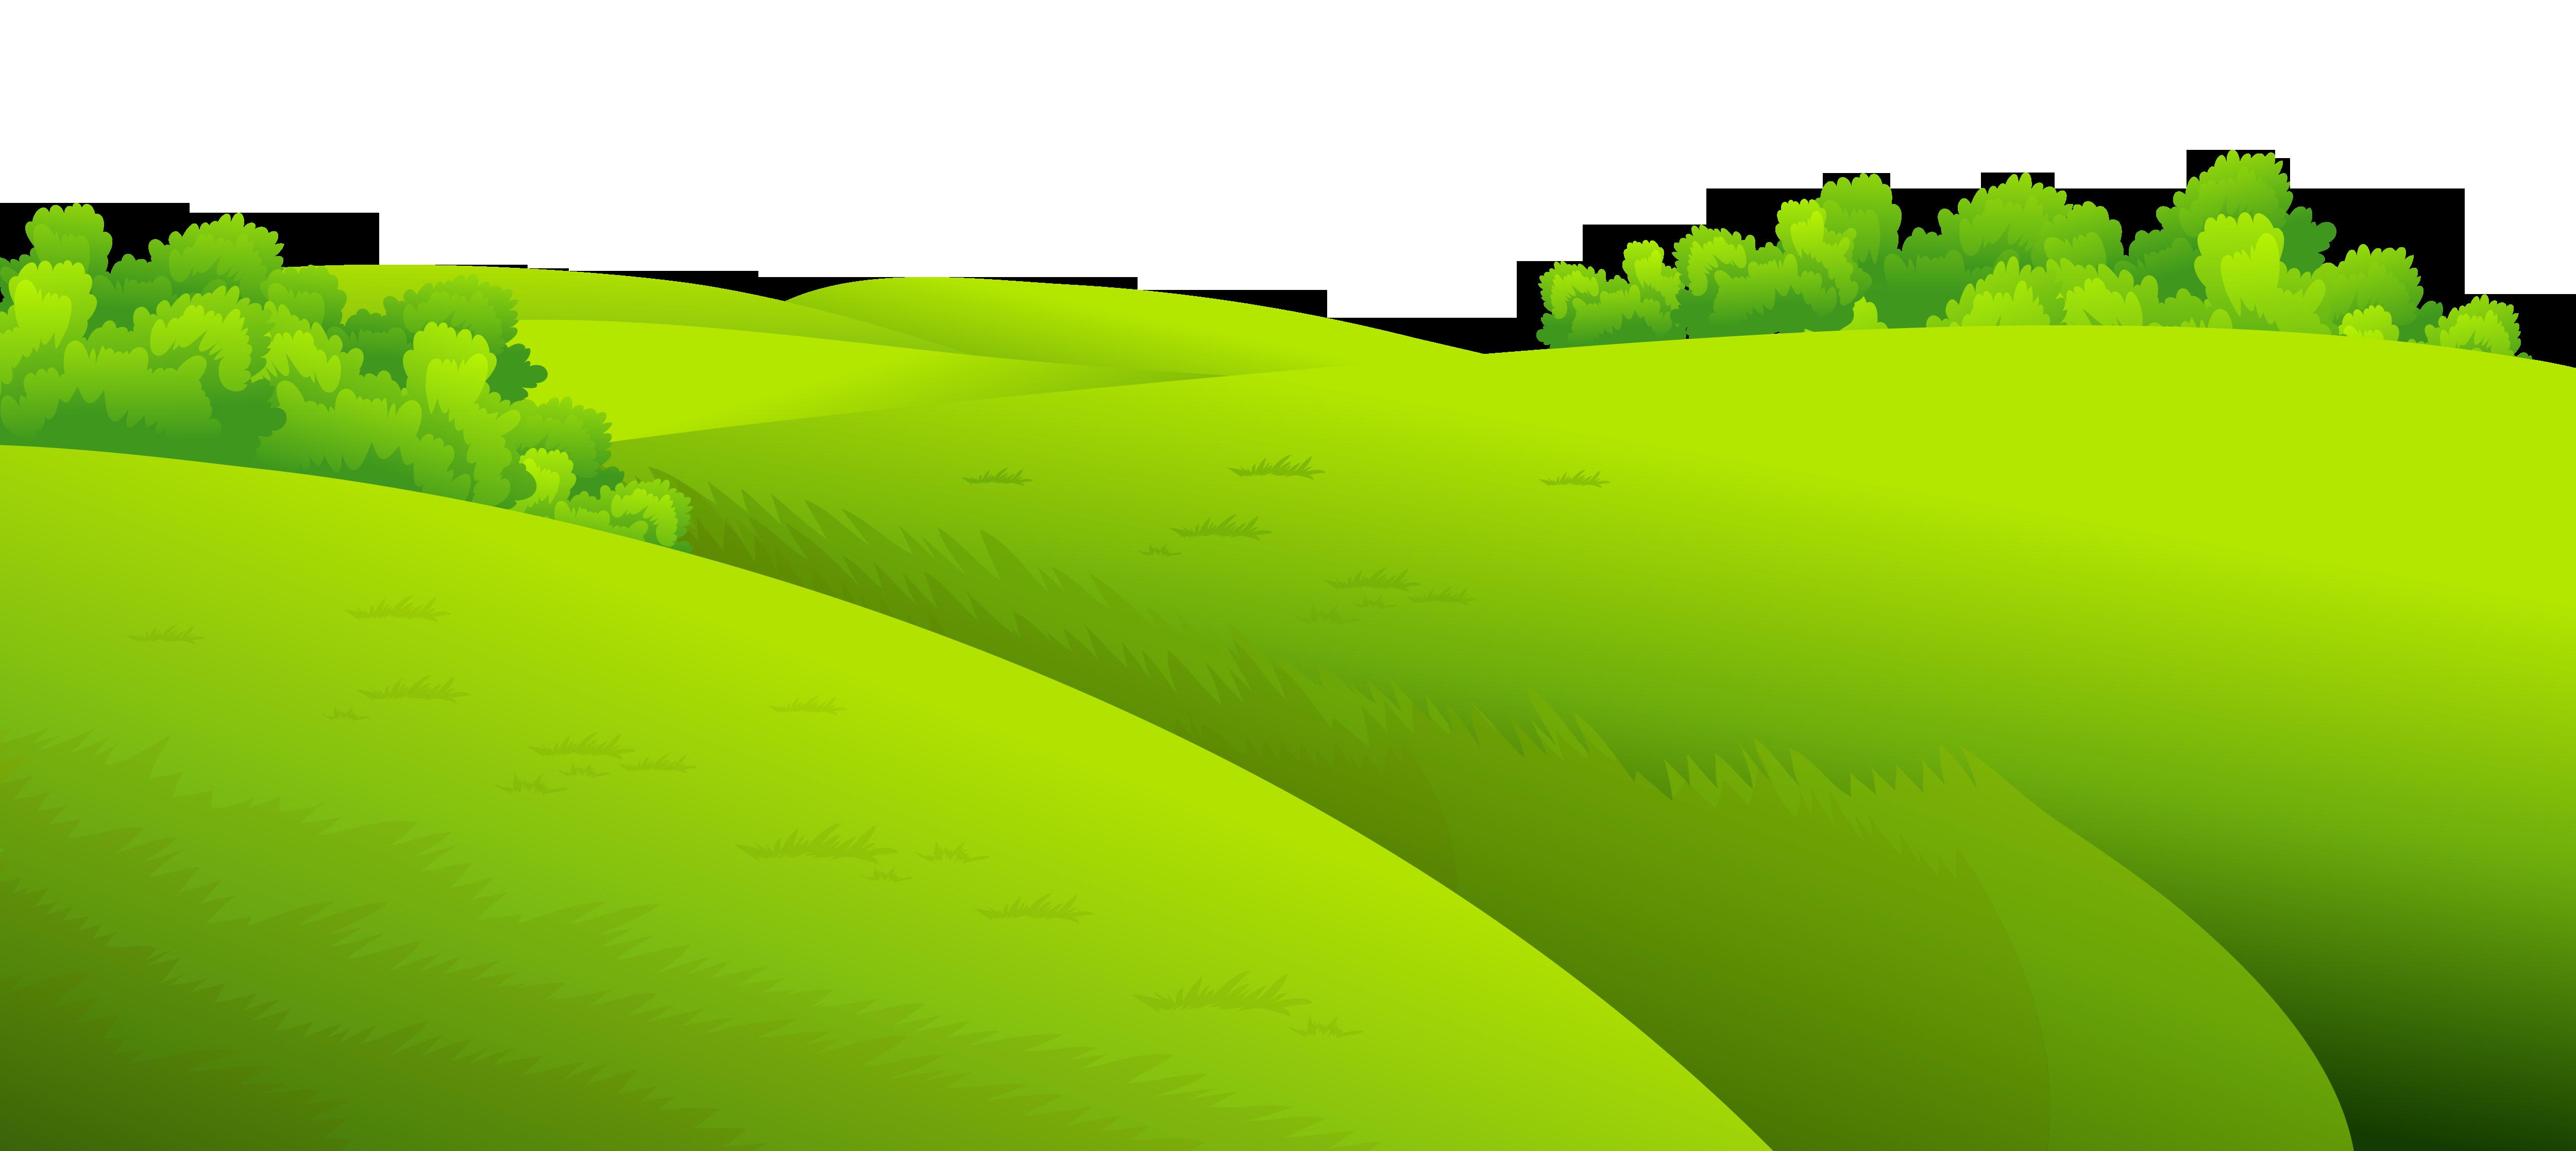 green grass ground png clip art galerija pinterest clip art rh pinterest com green grass background clipart green grass field clipart